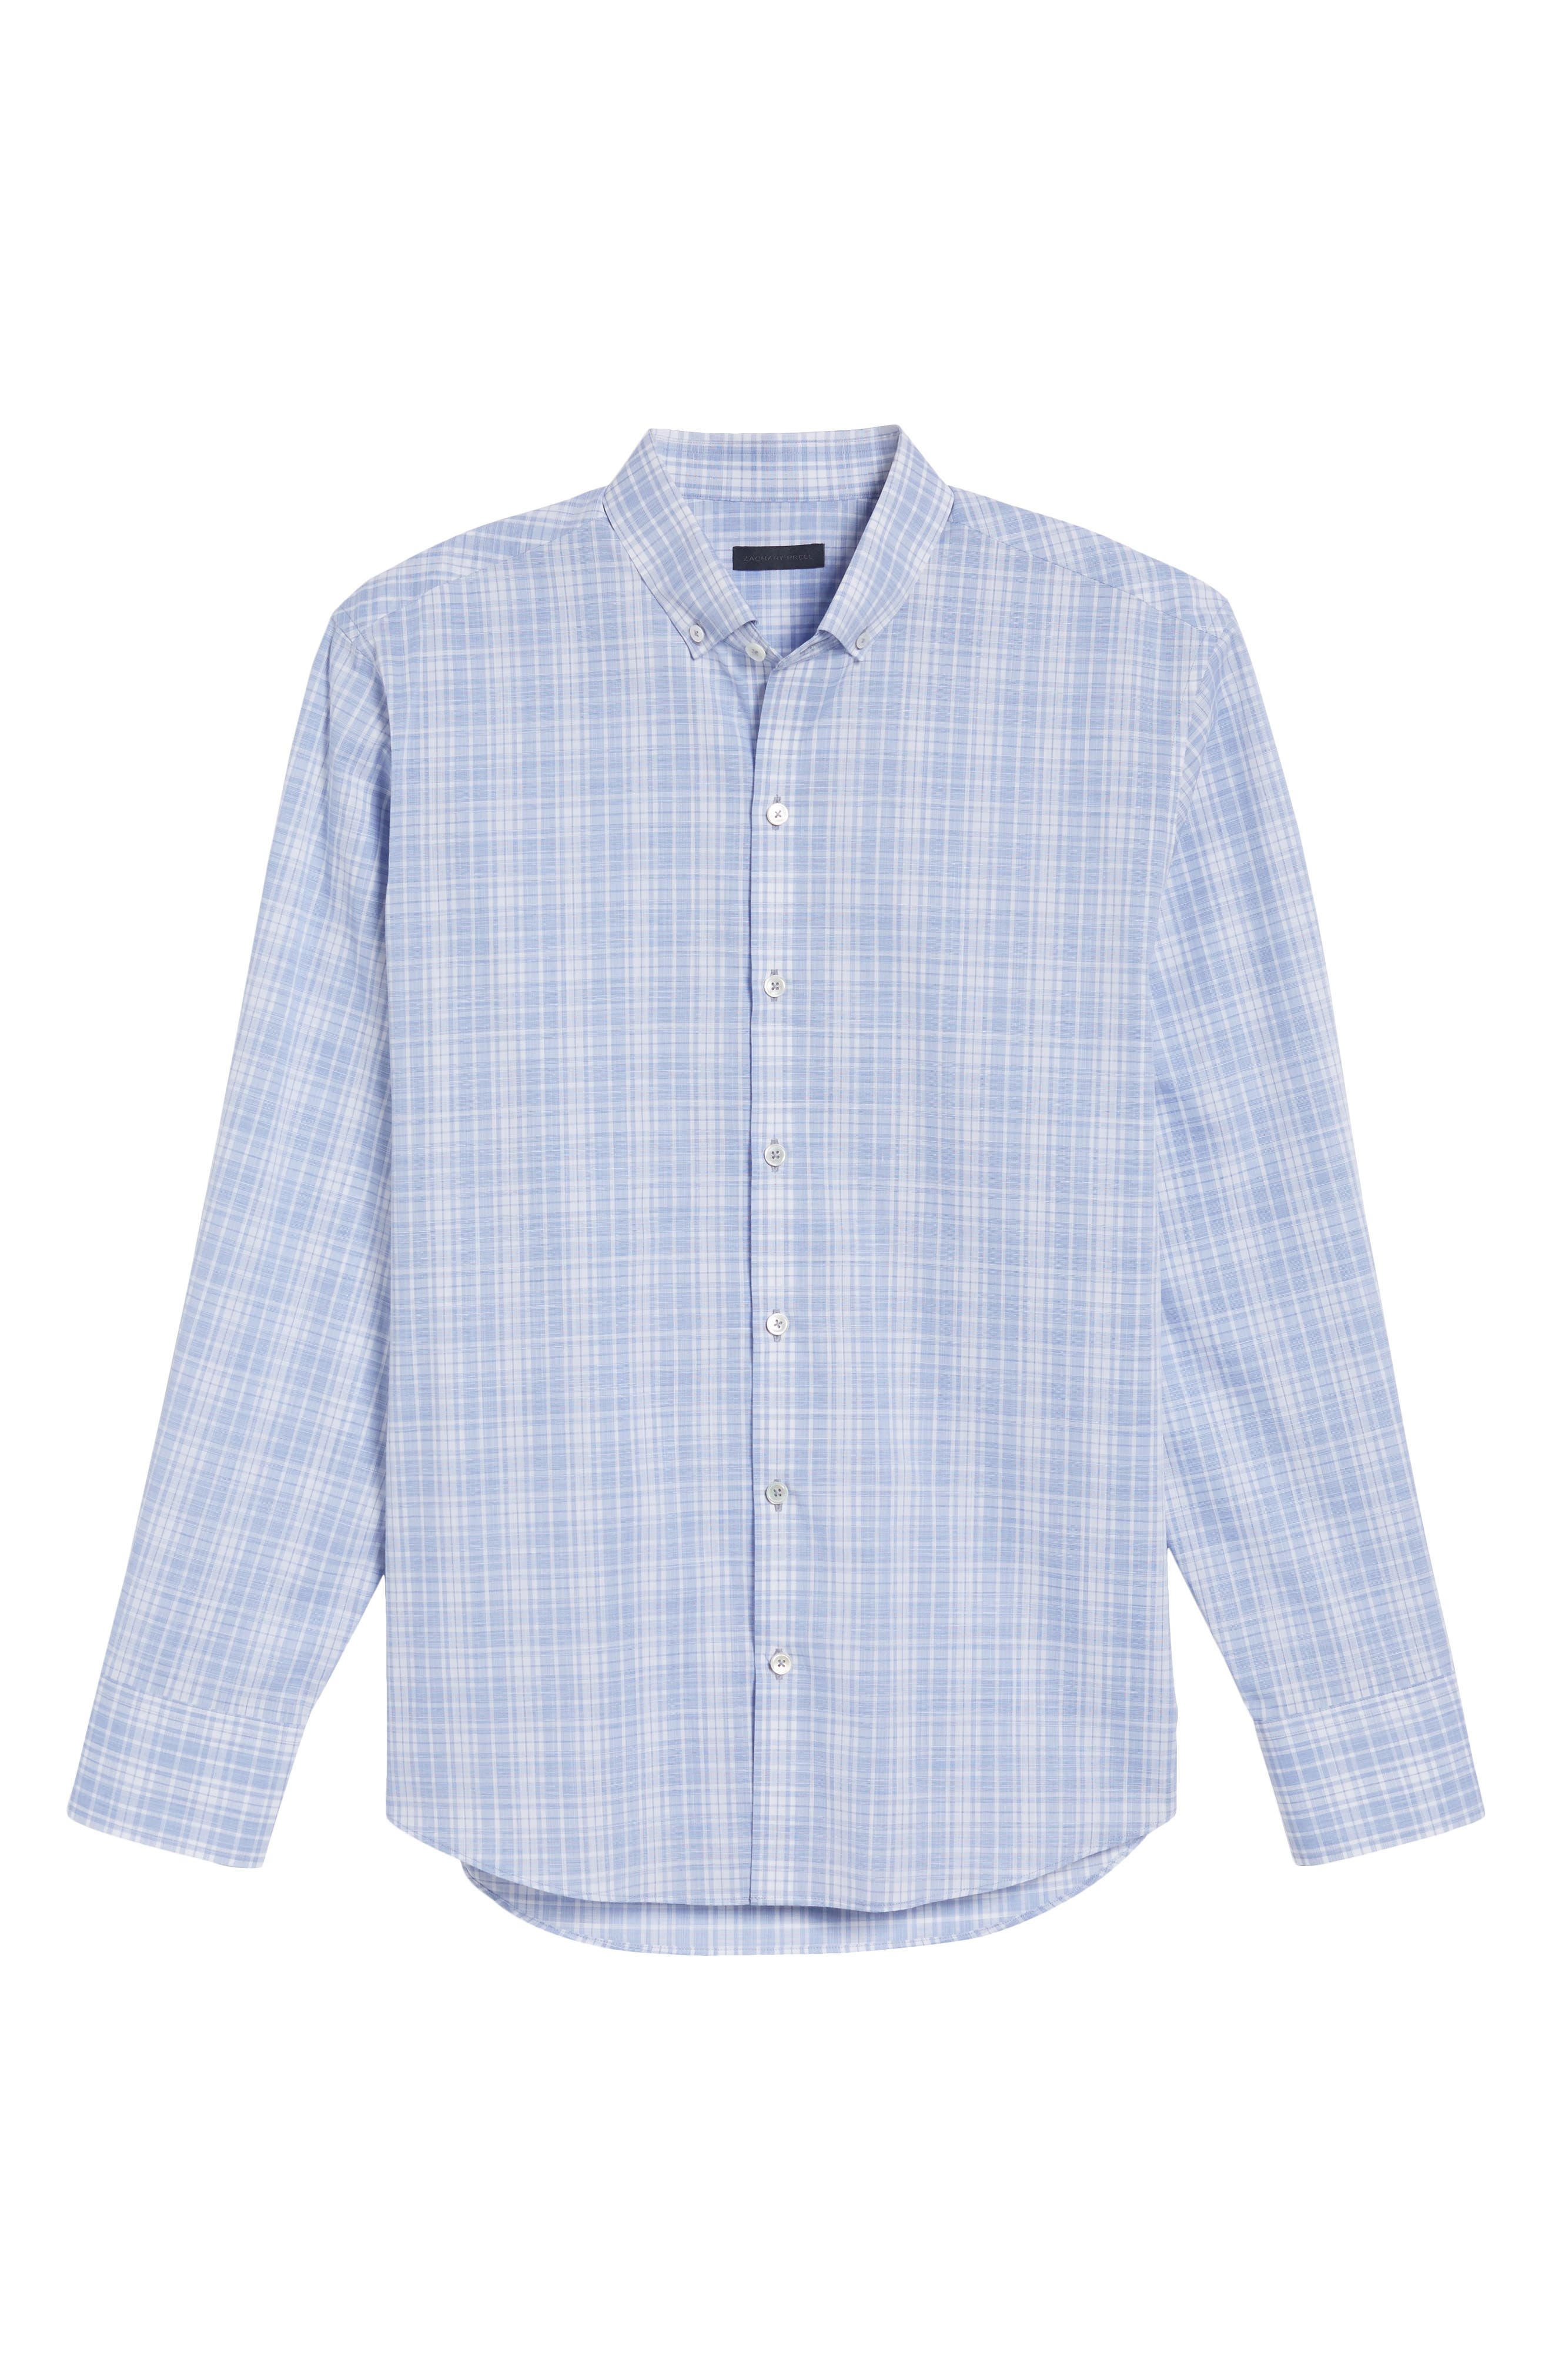 Cochran Slim Fit Plaid Sport Shirt,                             Alternate thumbnail 6, color,                             BLUE